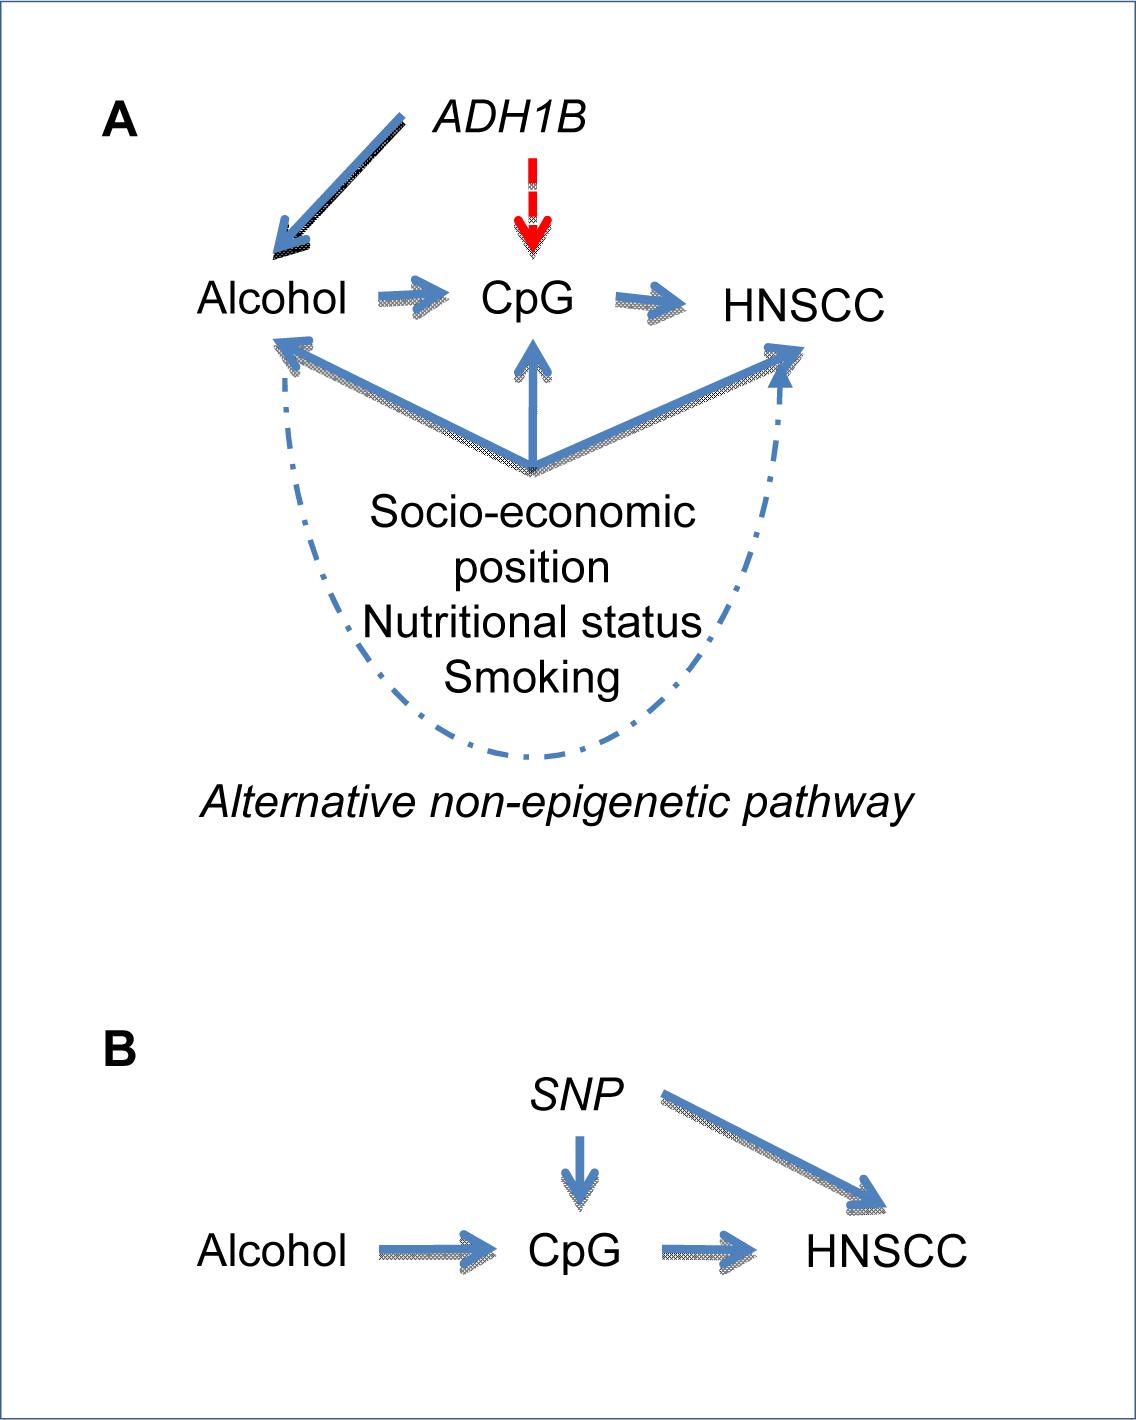 Incorporating epigenetic information in a Mendelian randomization framework.